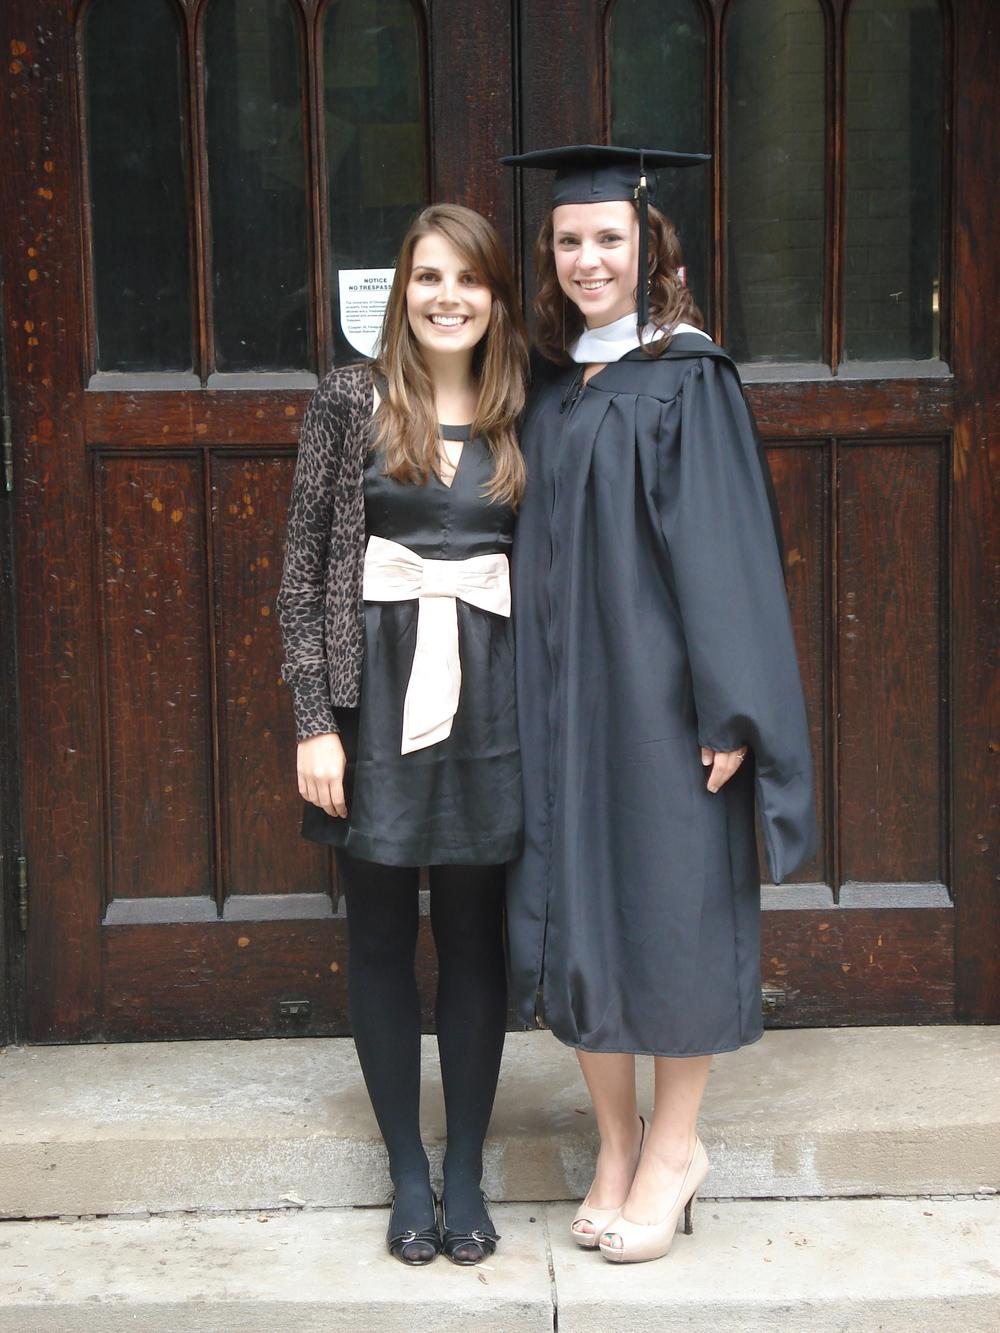 Kathy's graduation